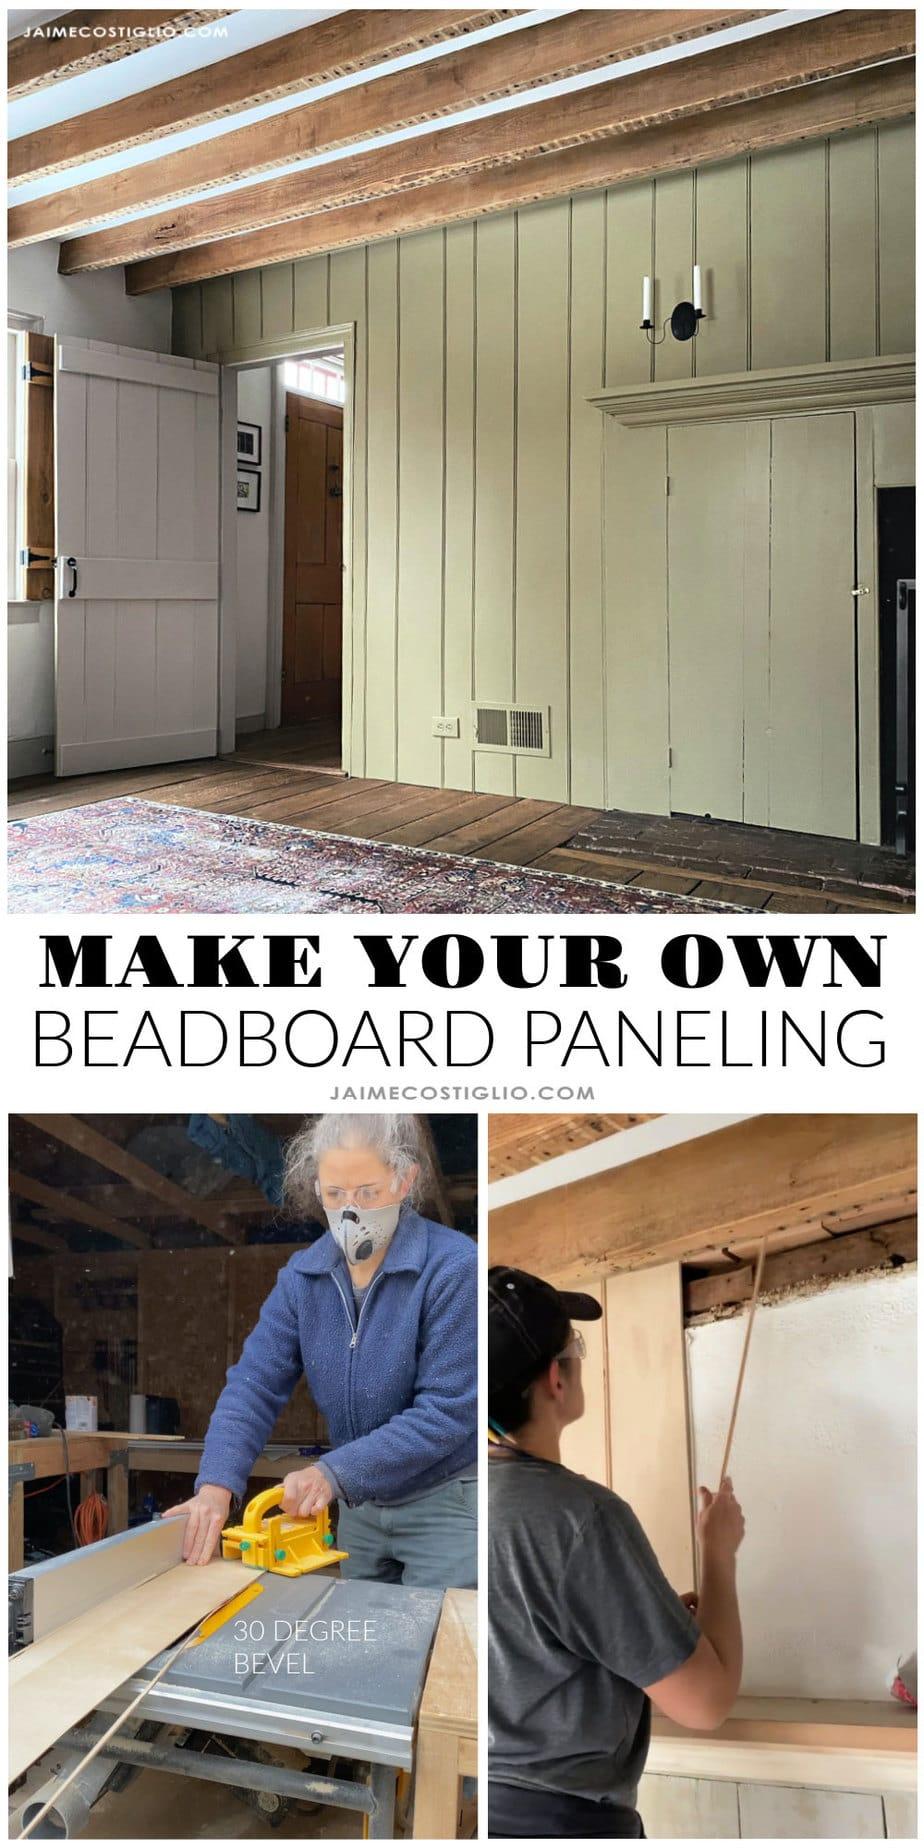 Diy beadboard paneling how to